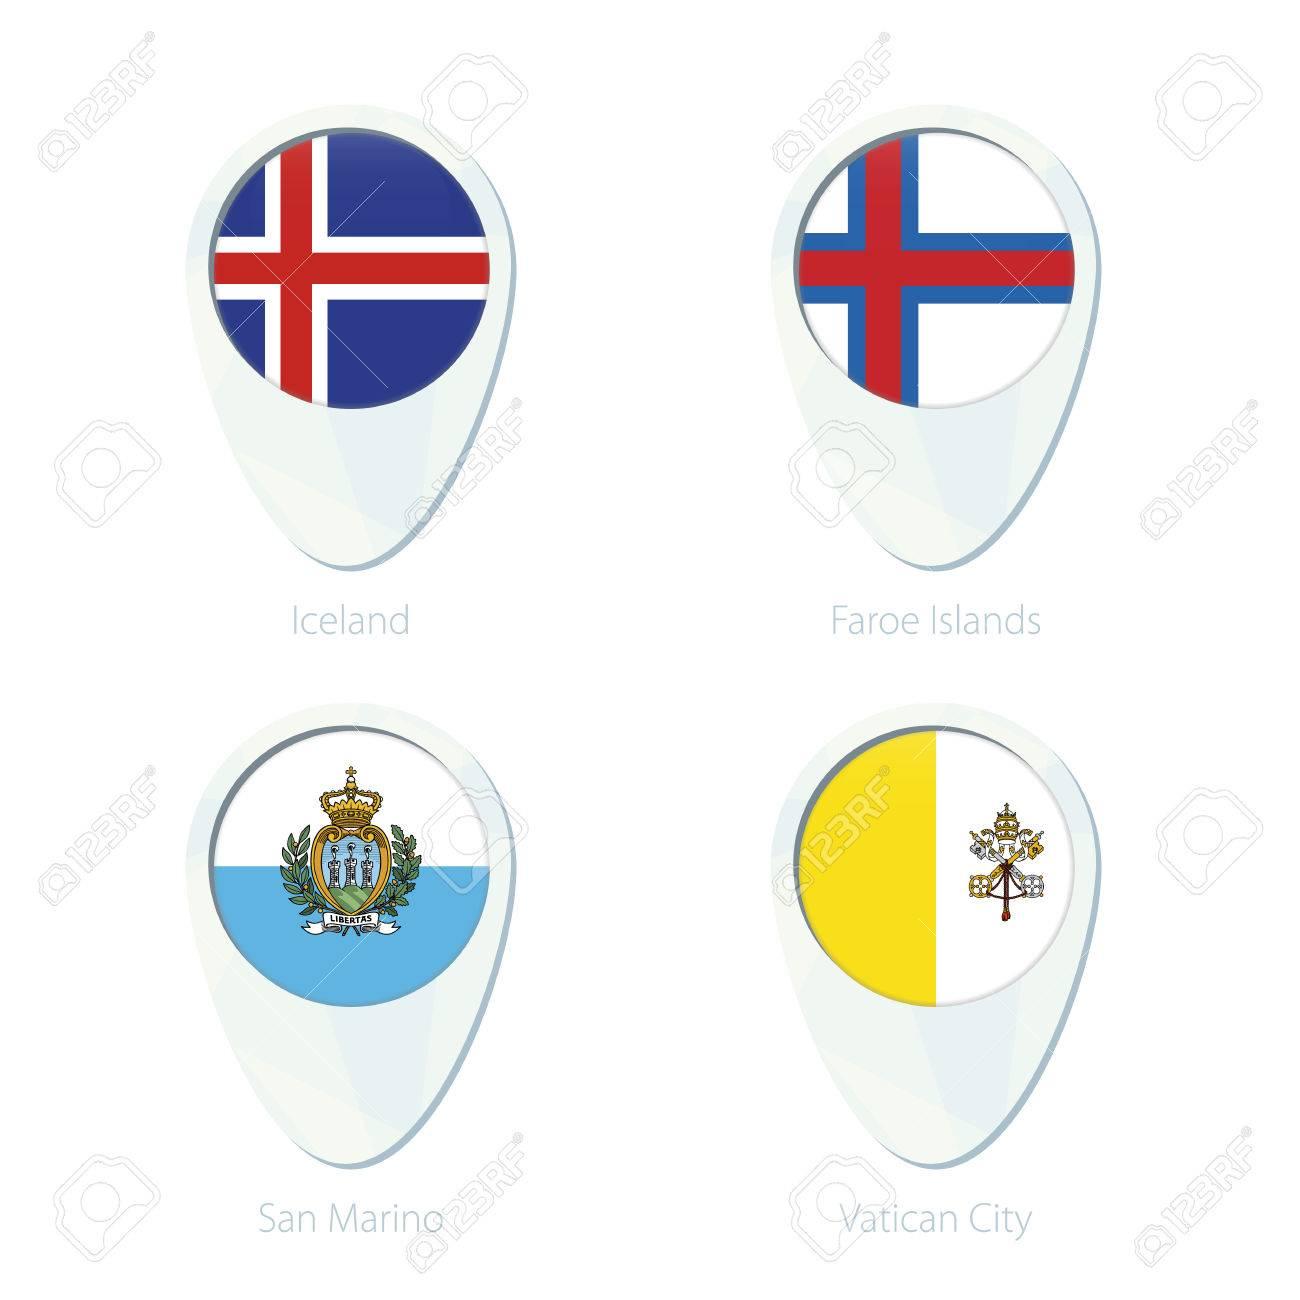 Iceland, Faroe Islands, San Marino, Vatican City flag location..